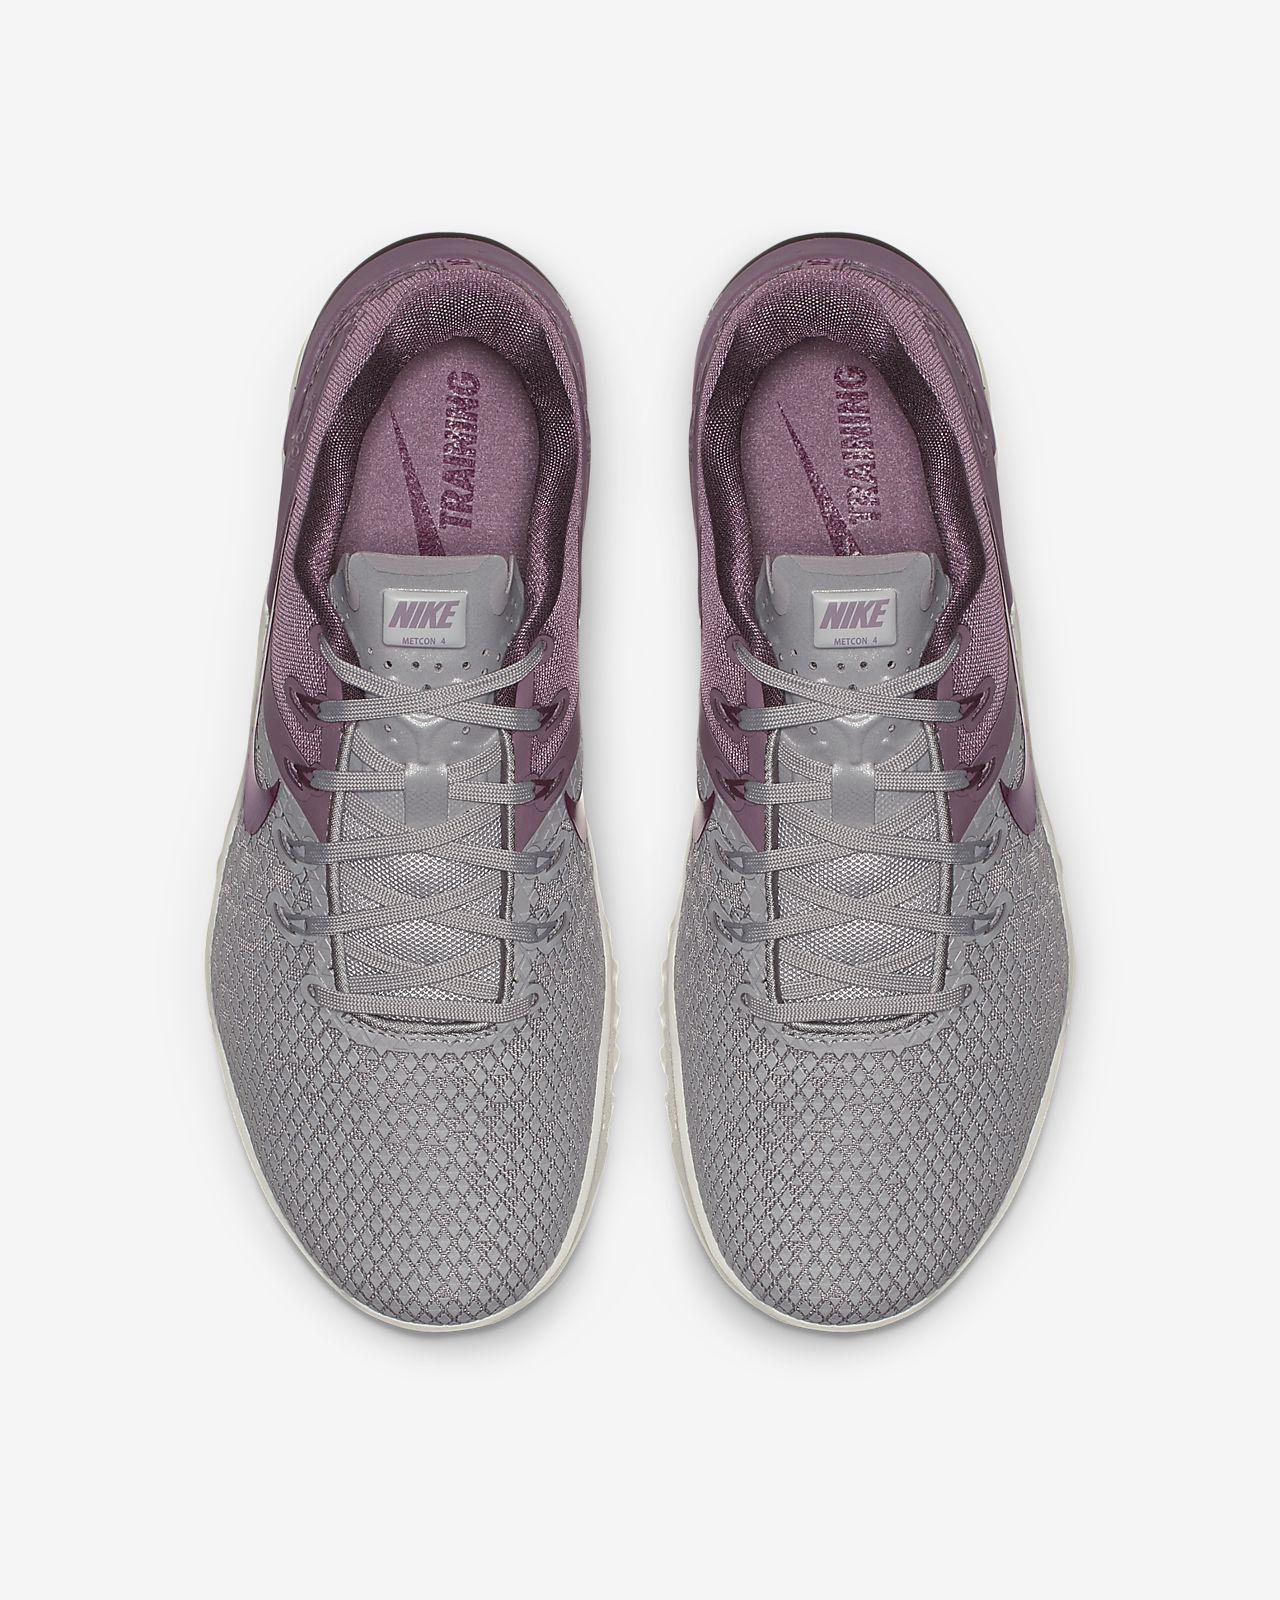 Nike Chaussure De Musculaire Training Et Renforcement Cross nXw80OPNk